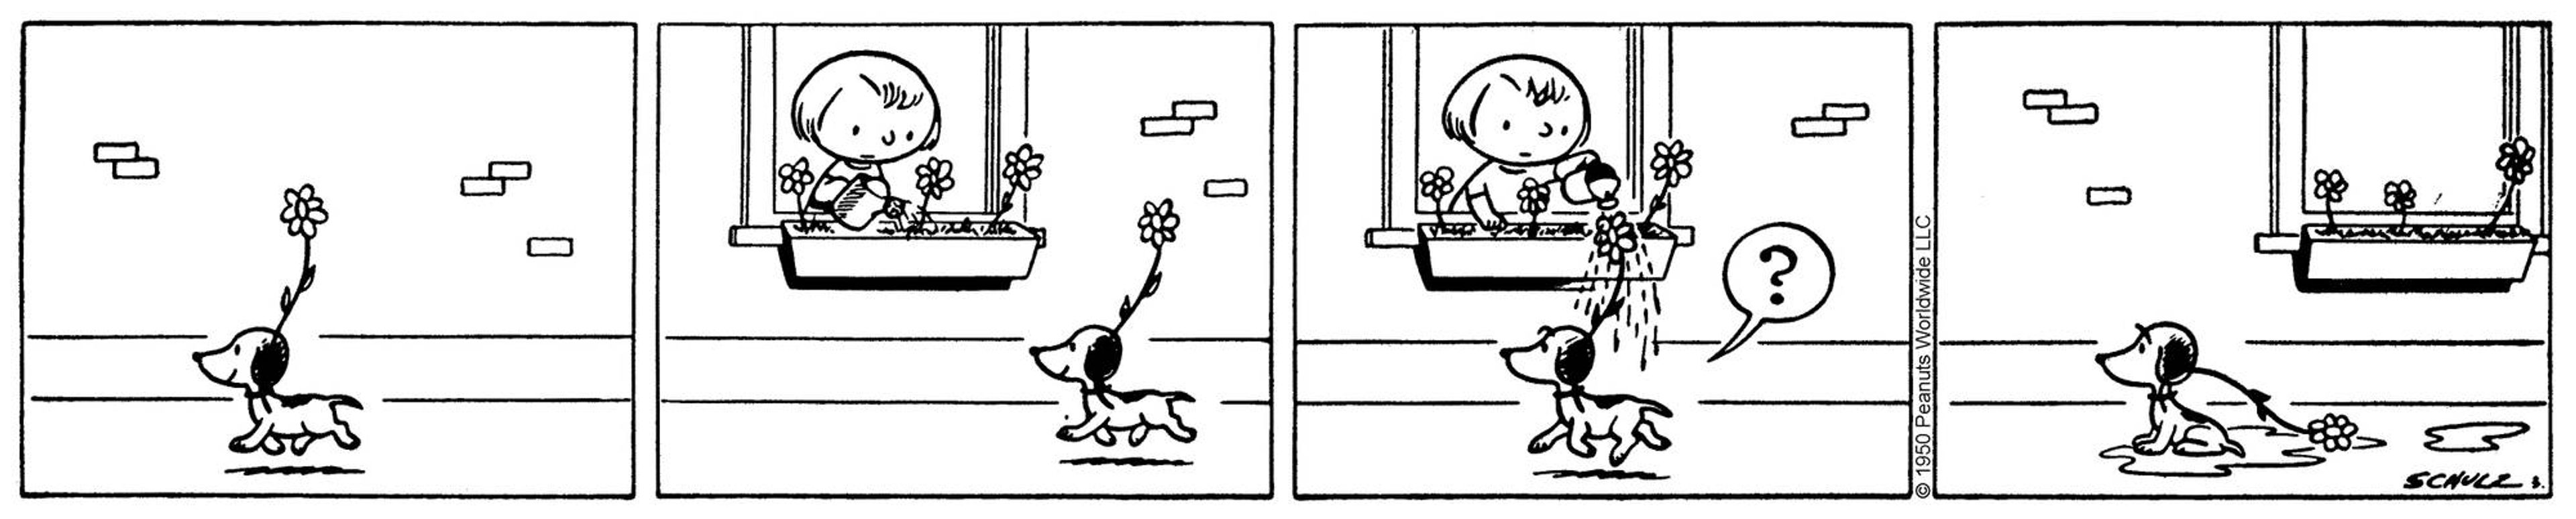 Early Peanuts comic strip